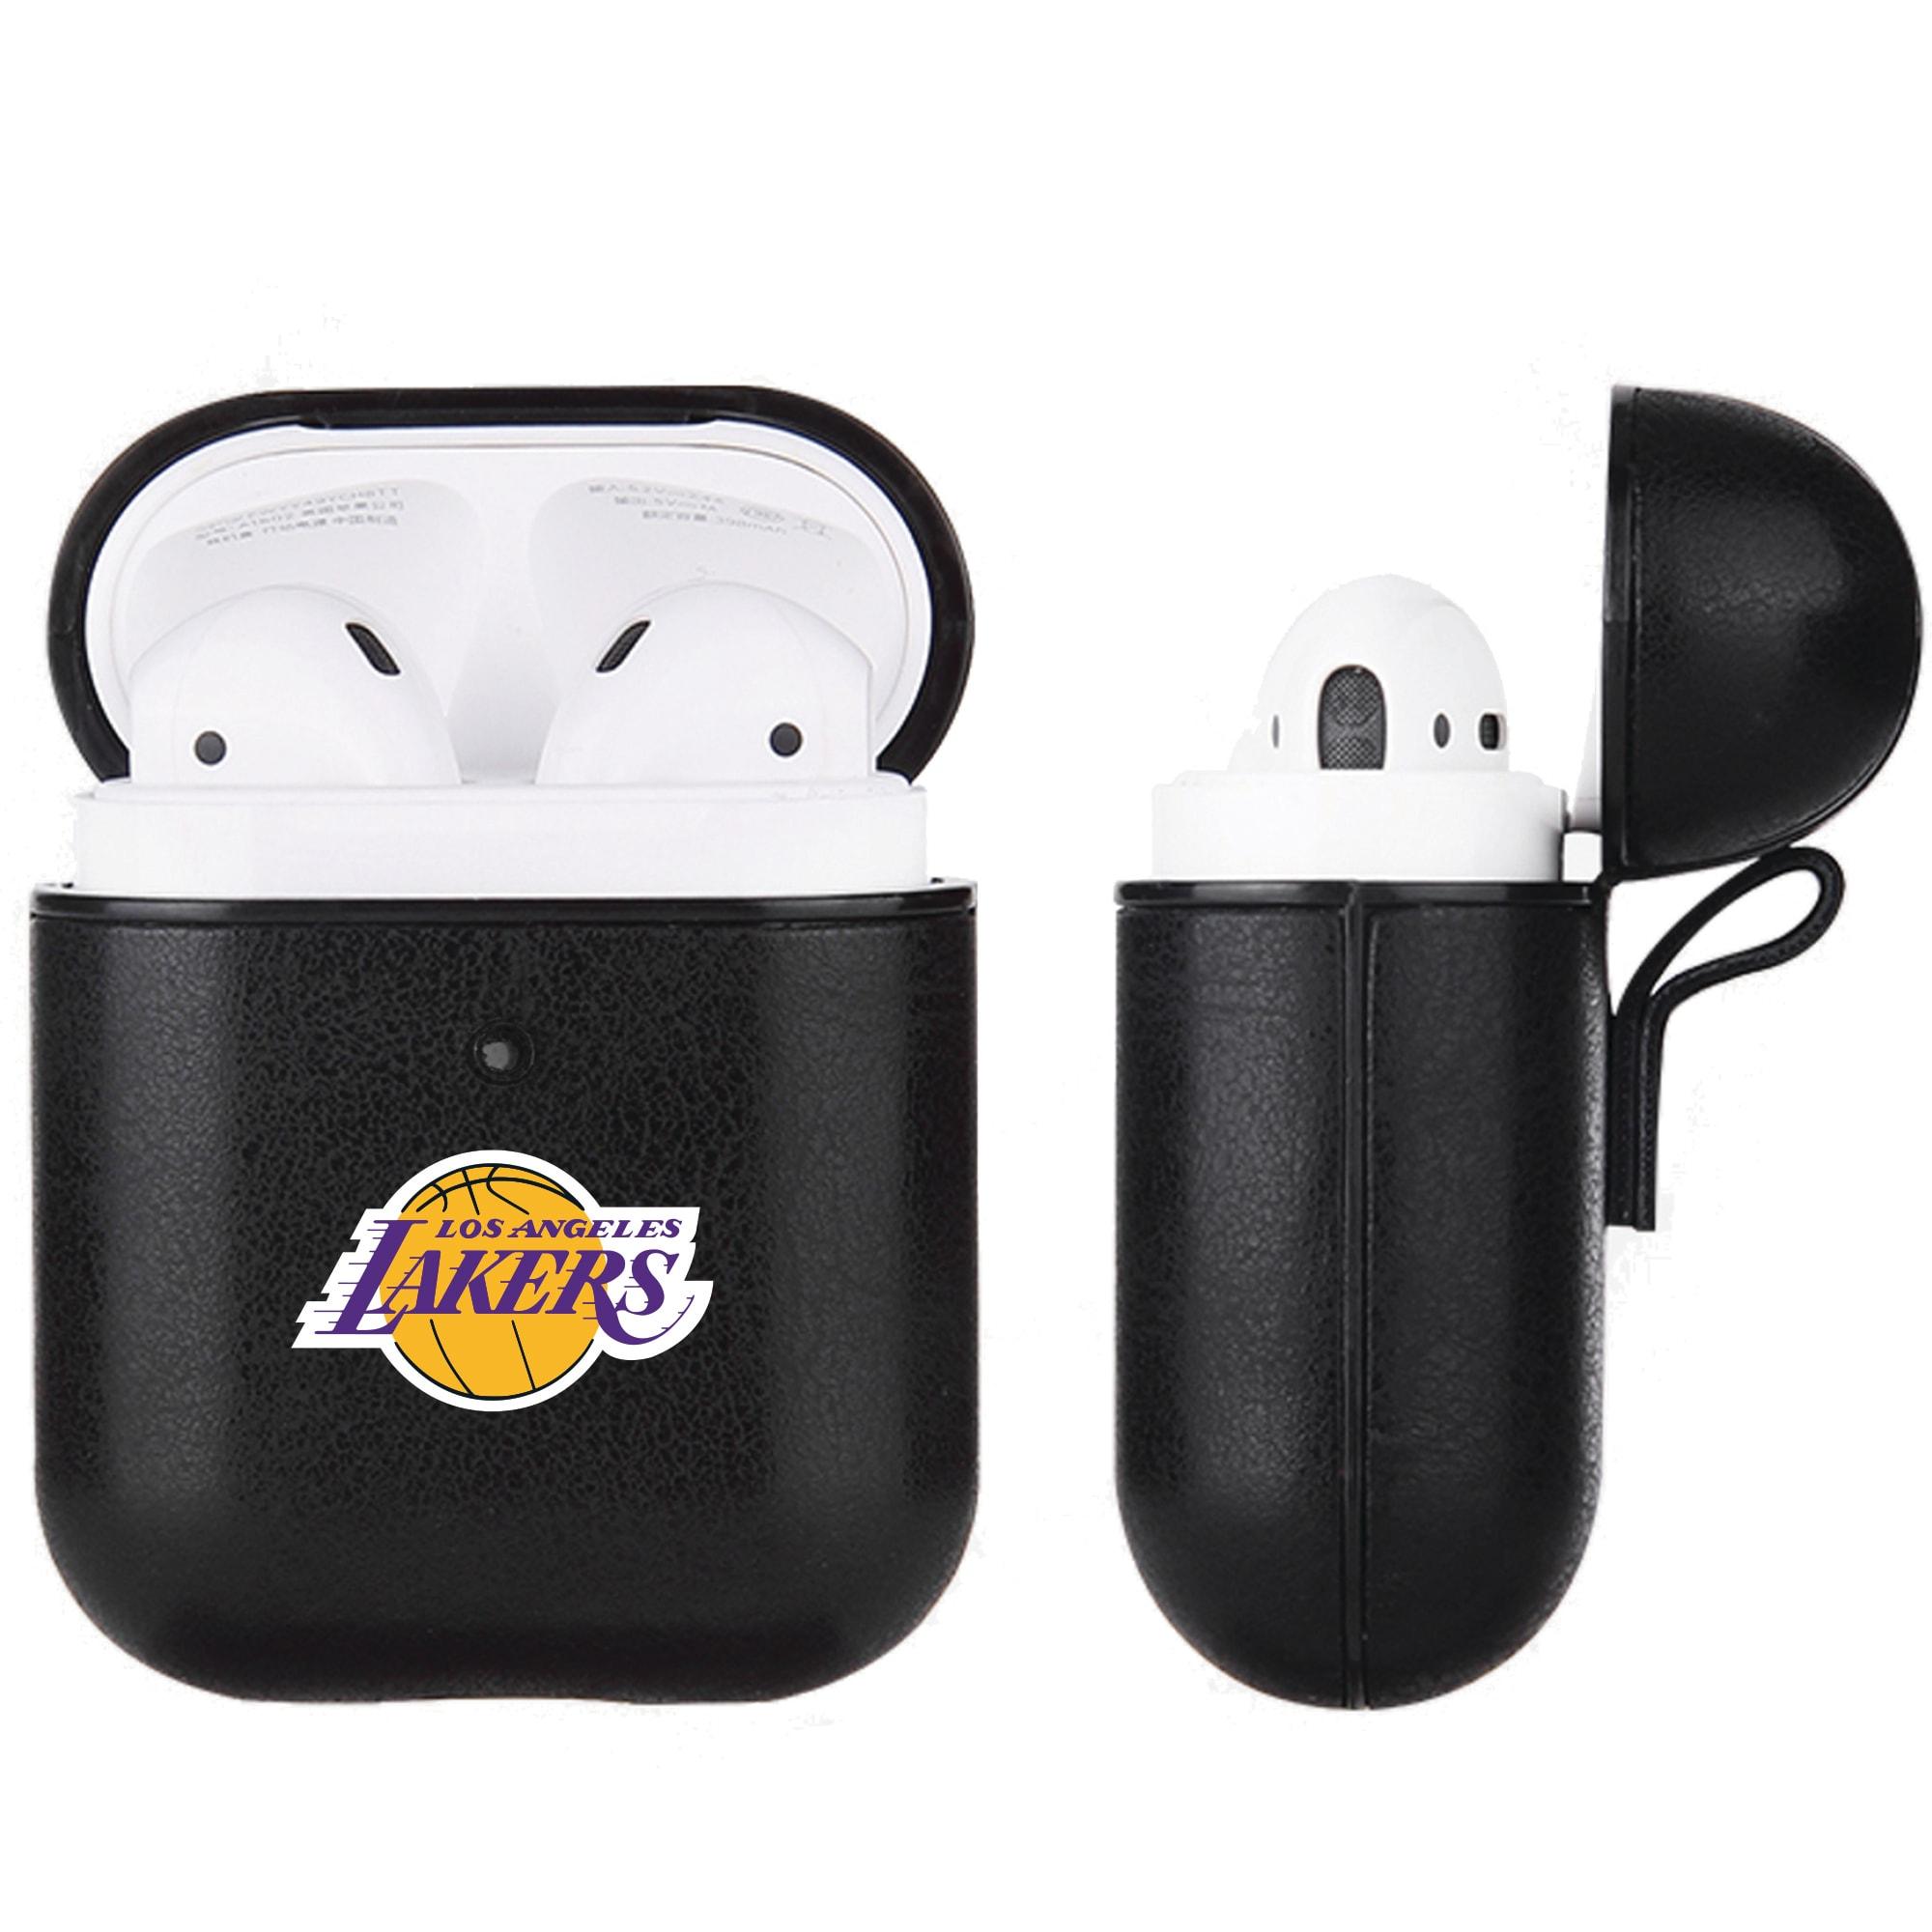 Los Angeles Lakers Air Pods Black Leatherette Case